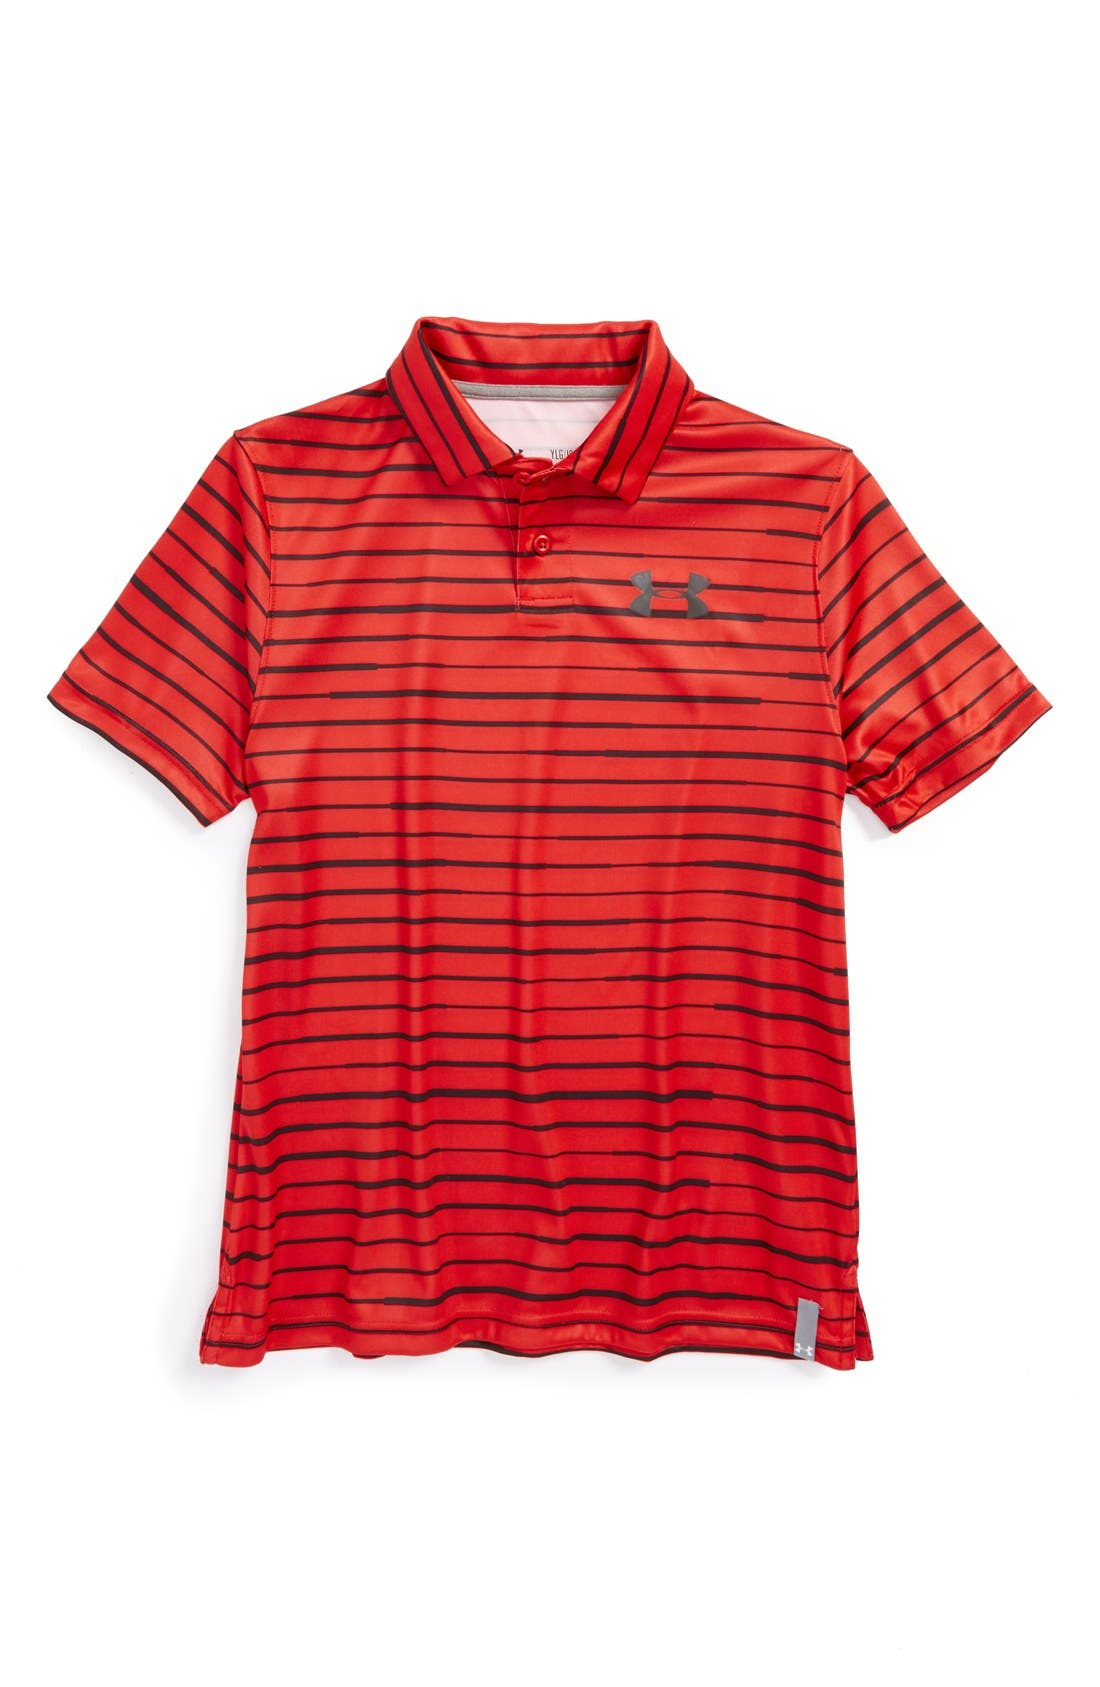 Main Image - Under Armour 'Seismic Stripe' Tech Polo Shirt (Big Boys)